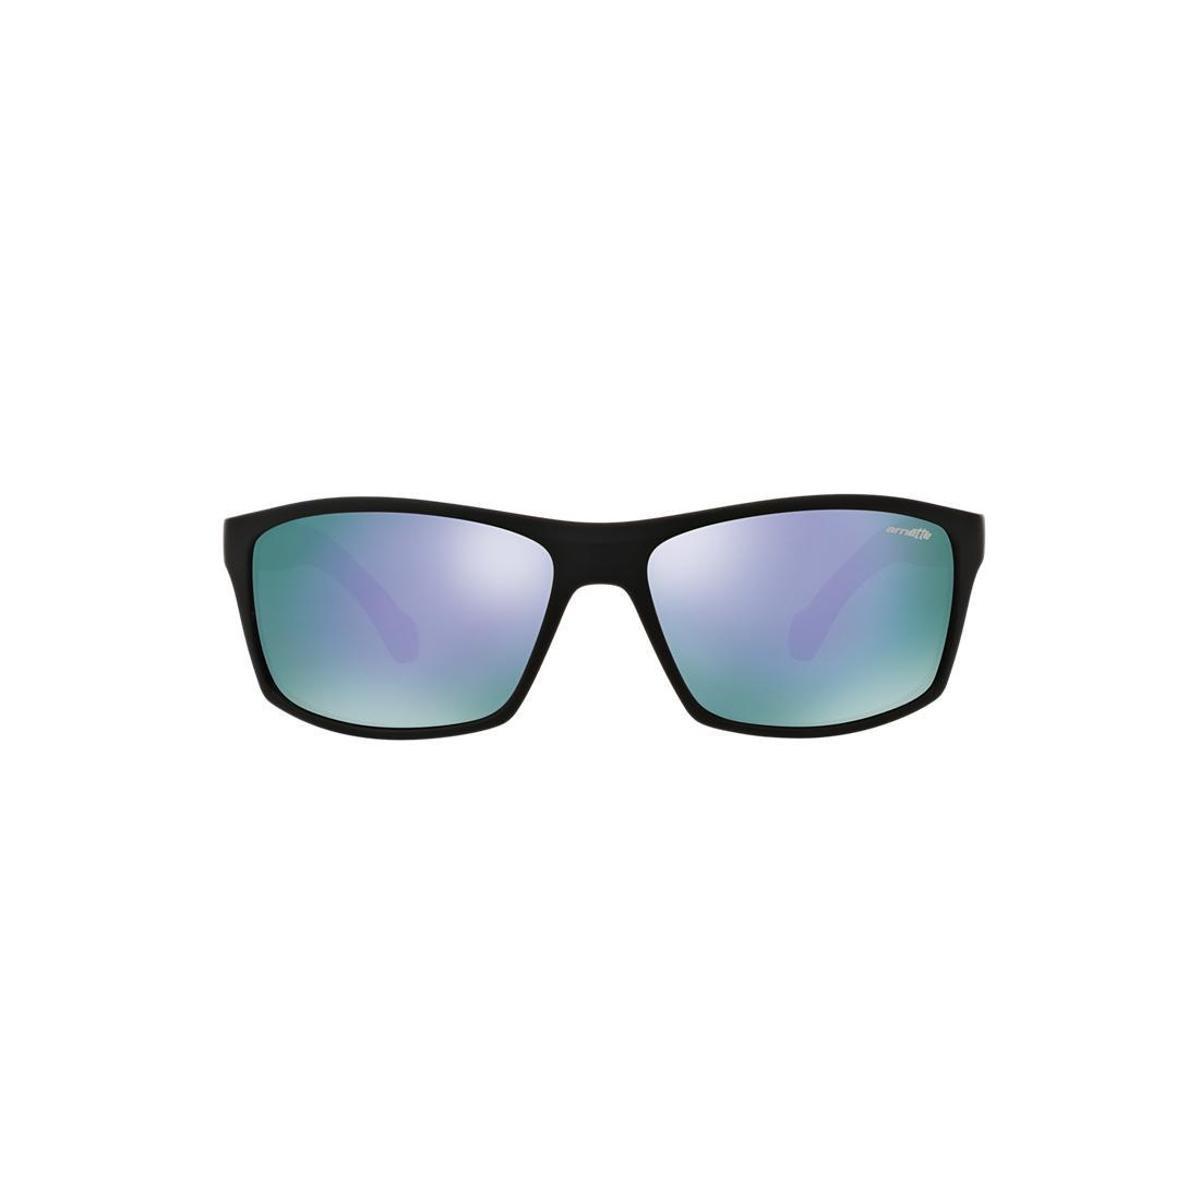 526674577eaff Óculos de Sol Arnette Retângular AN4207 Boiler Masculino - Compre ...